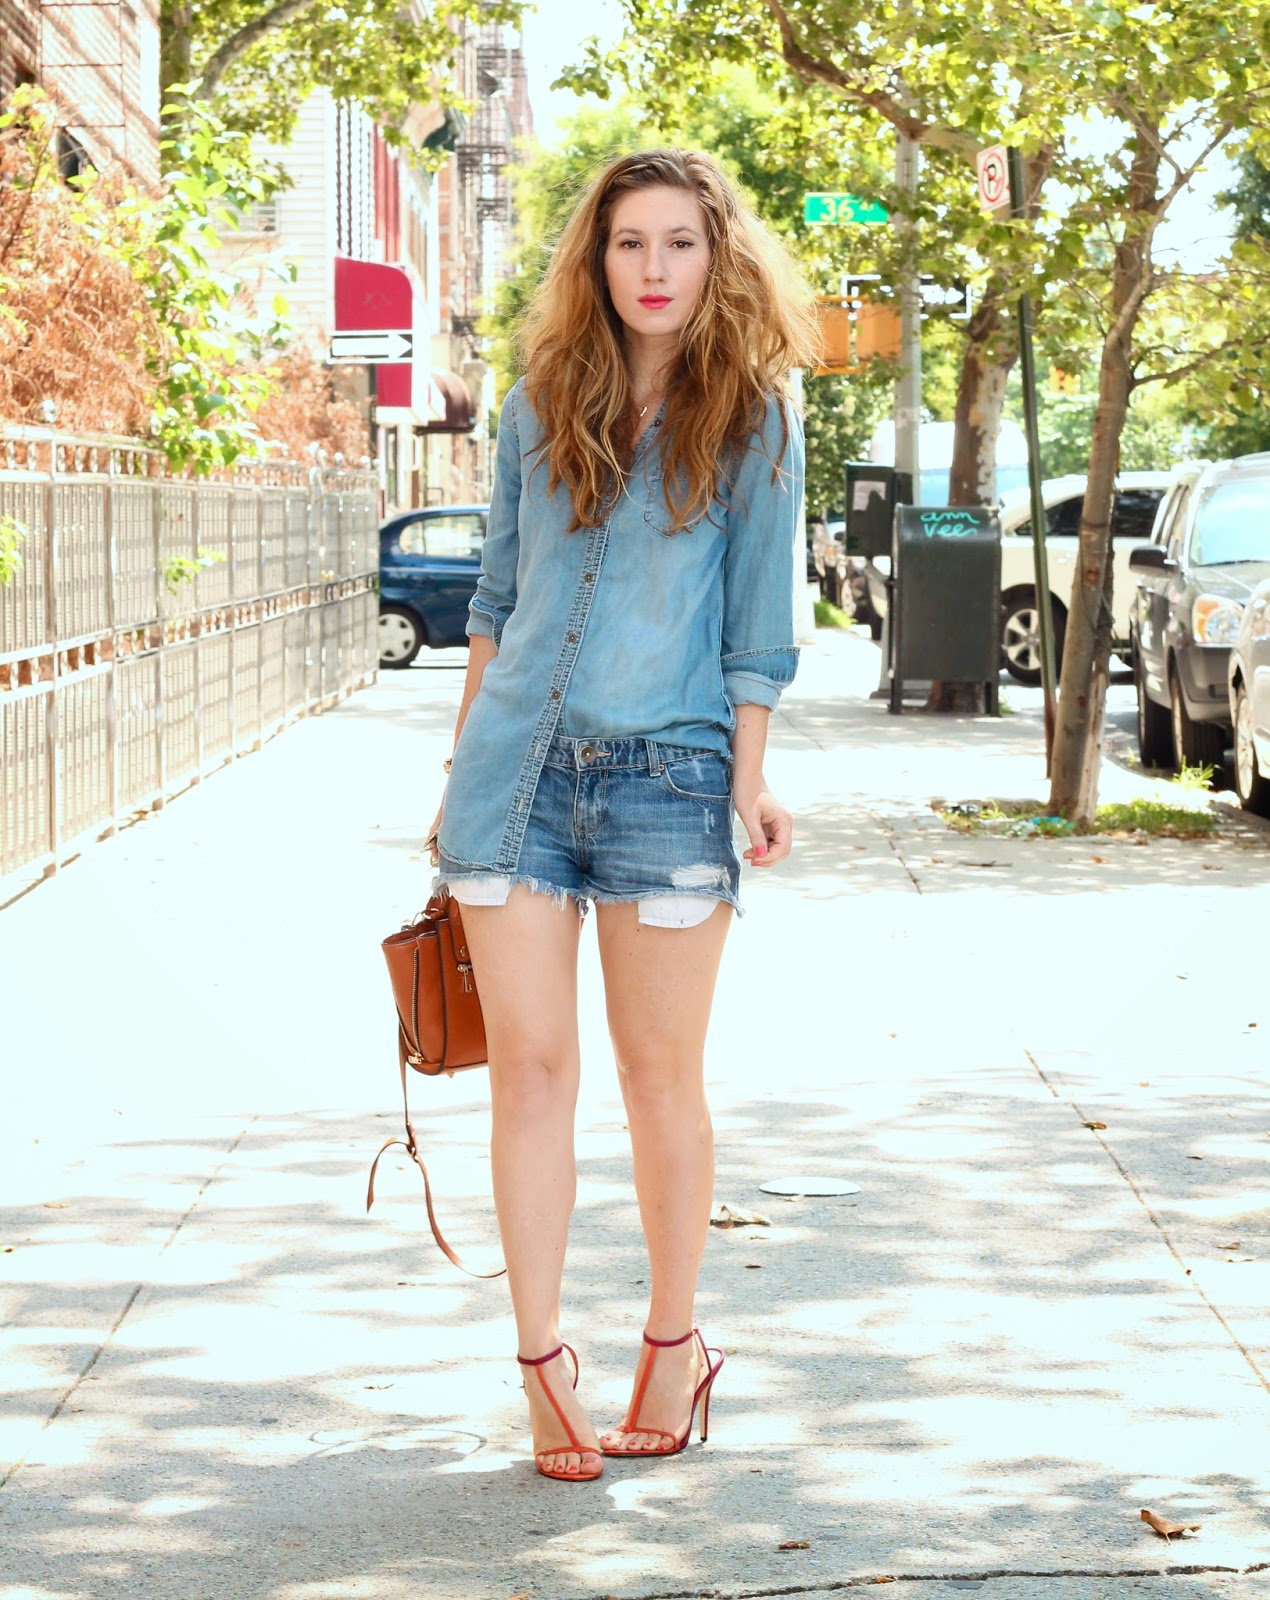 summer style, street style nyc, denim on denim bloggers, how to wear cutoffs